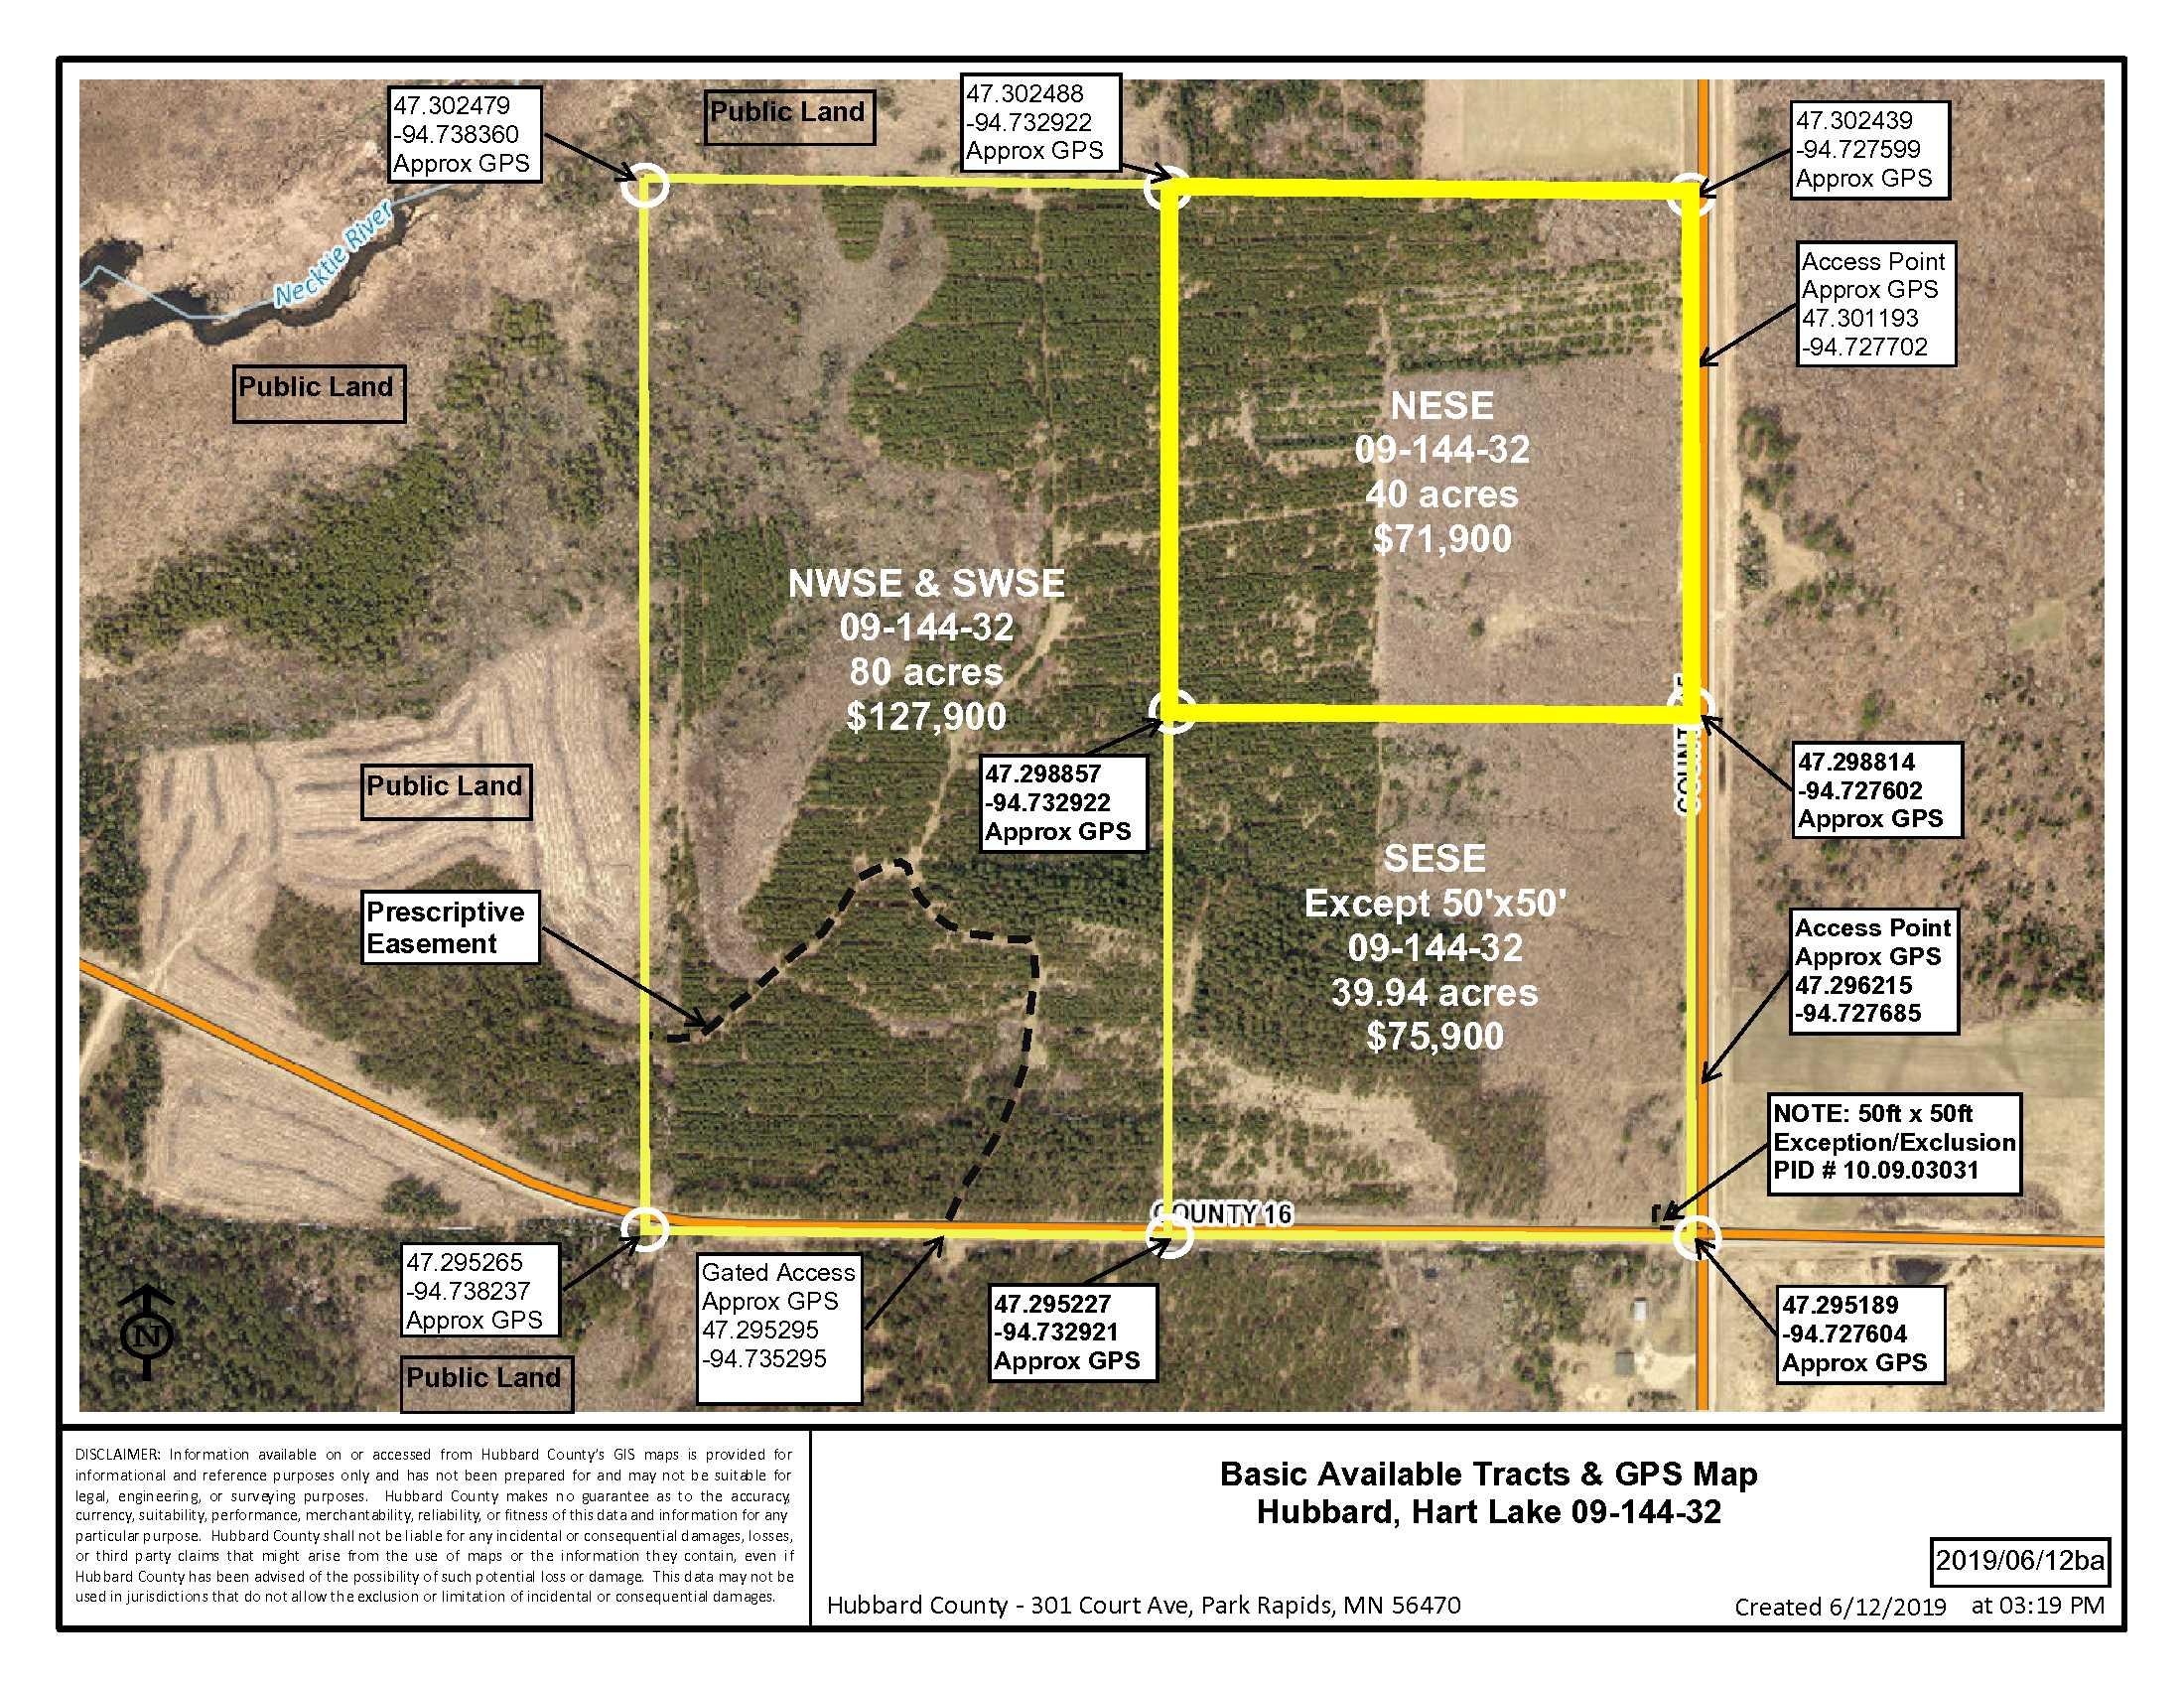 NESE, Co Rd 45, Hart Lake Twp, Laporte, Hubbard County